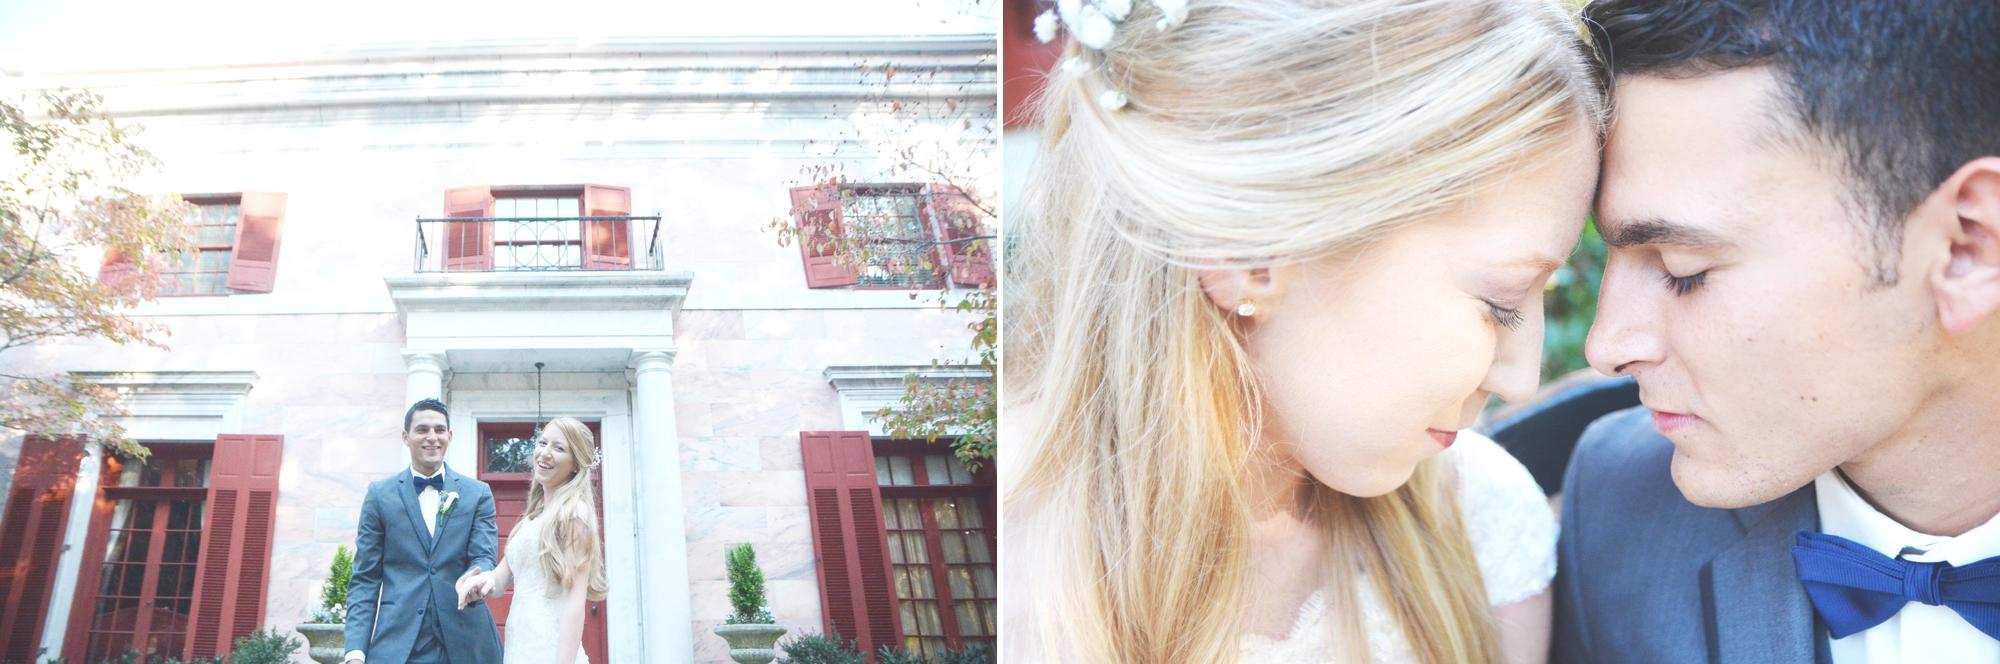 tate-house-wedding-six-hearts-photography030